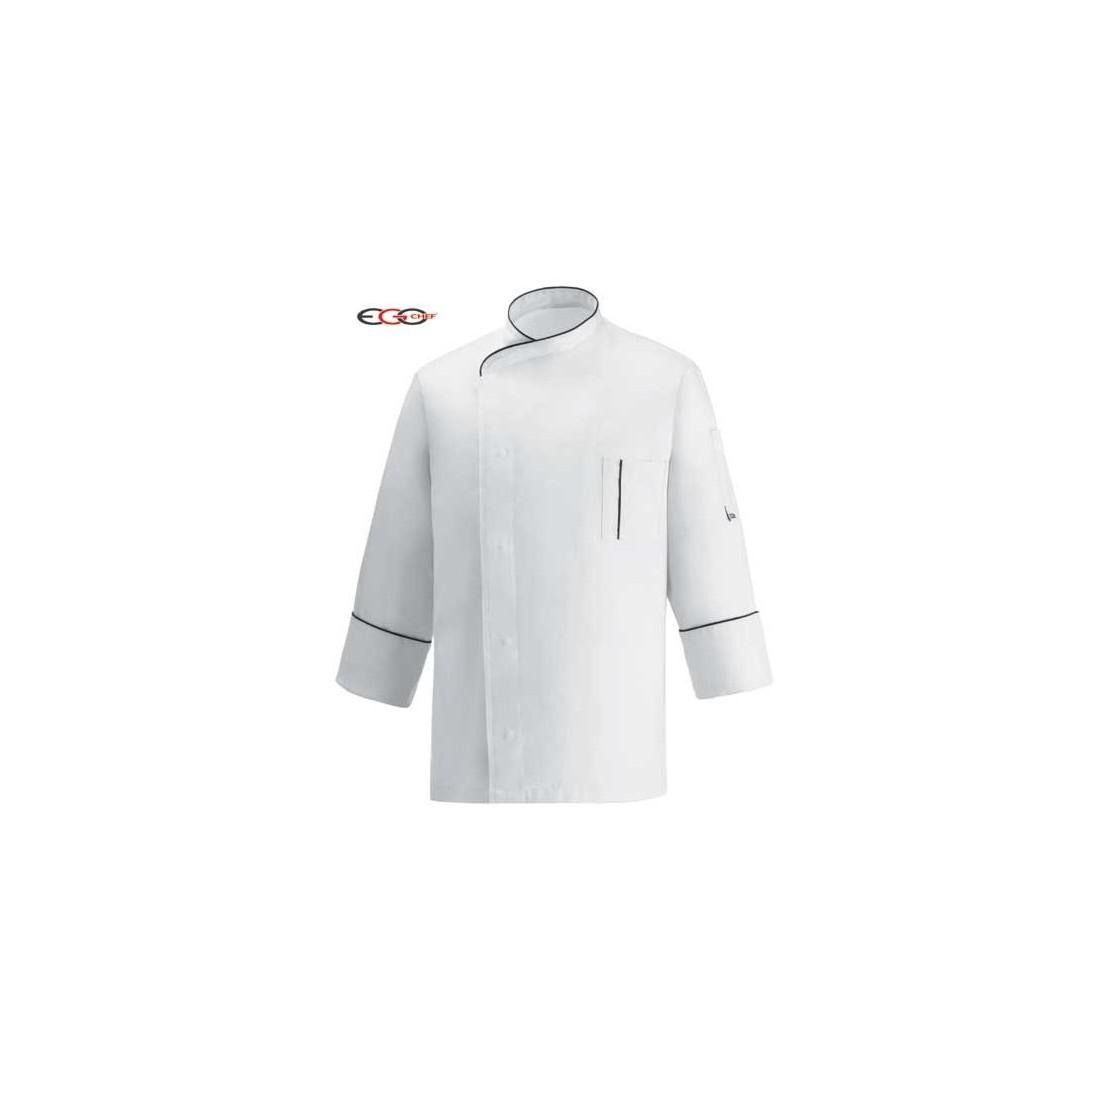 Chaqueta cocinero modelo Cesare